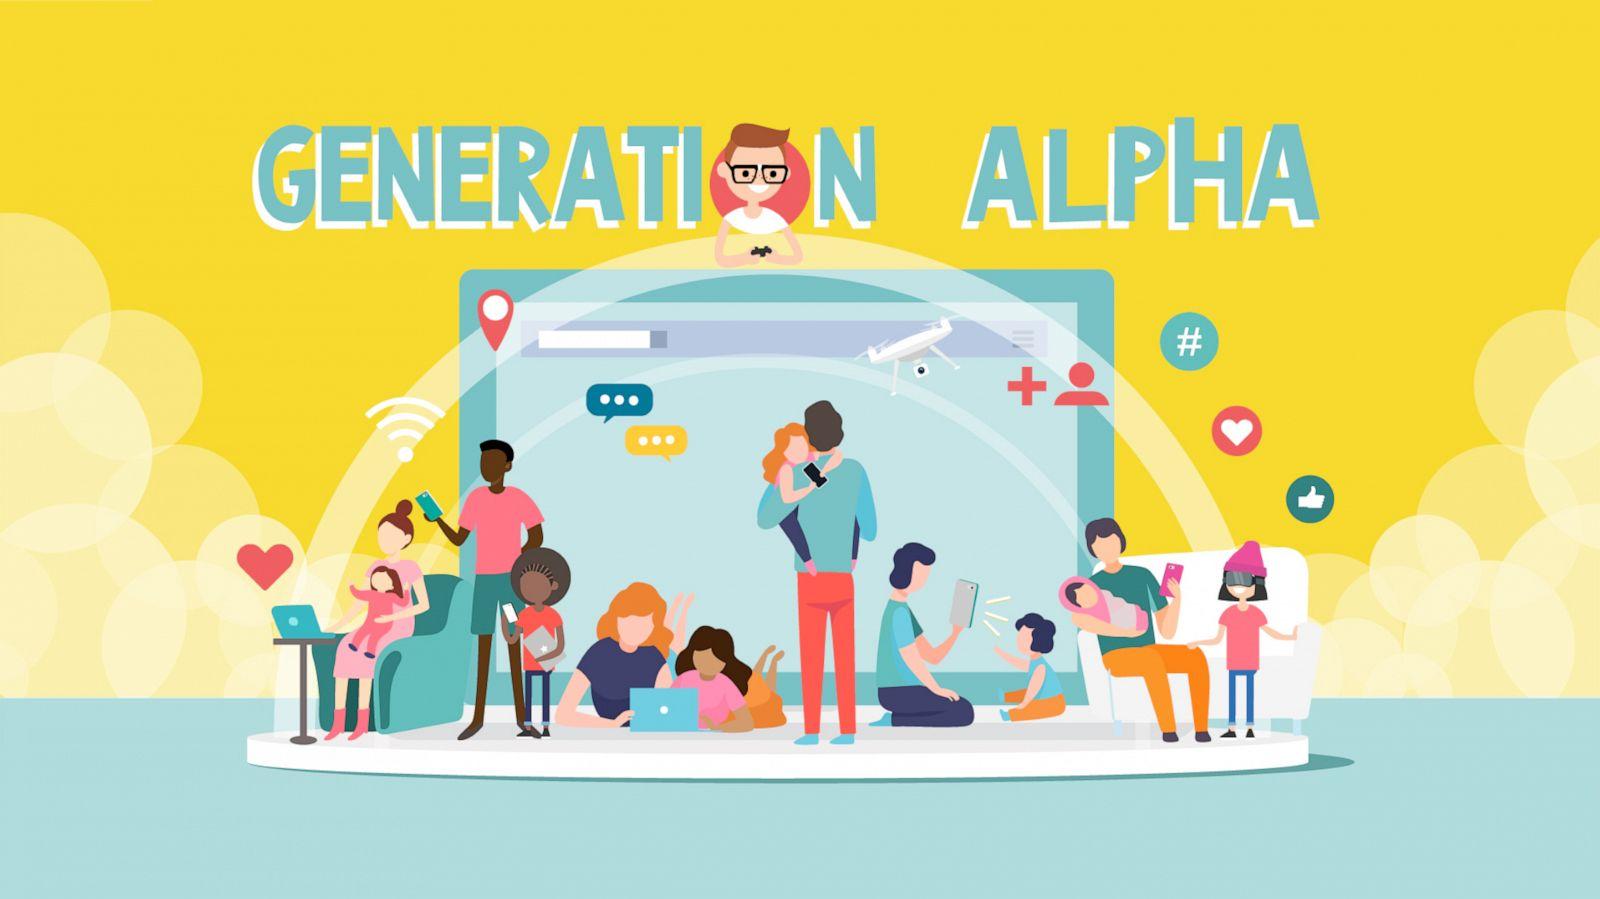 Thế hệ Alpha